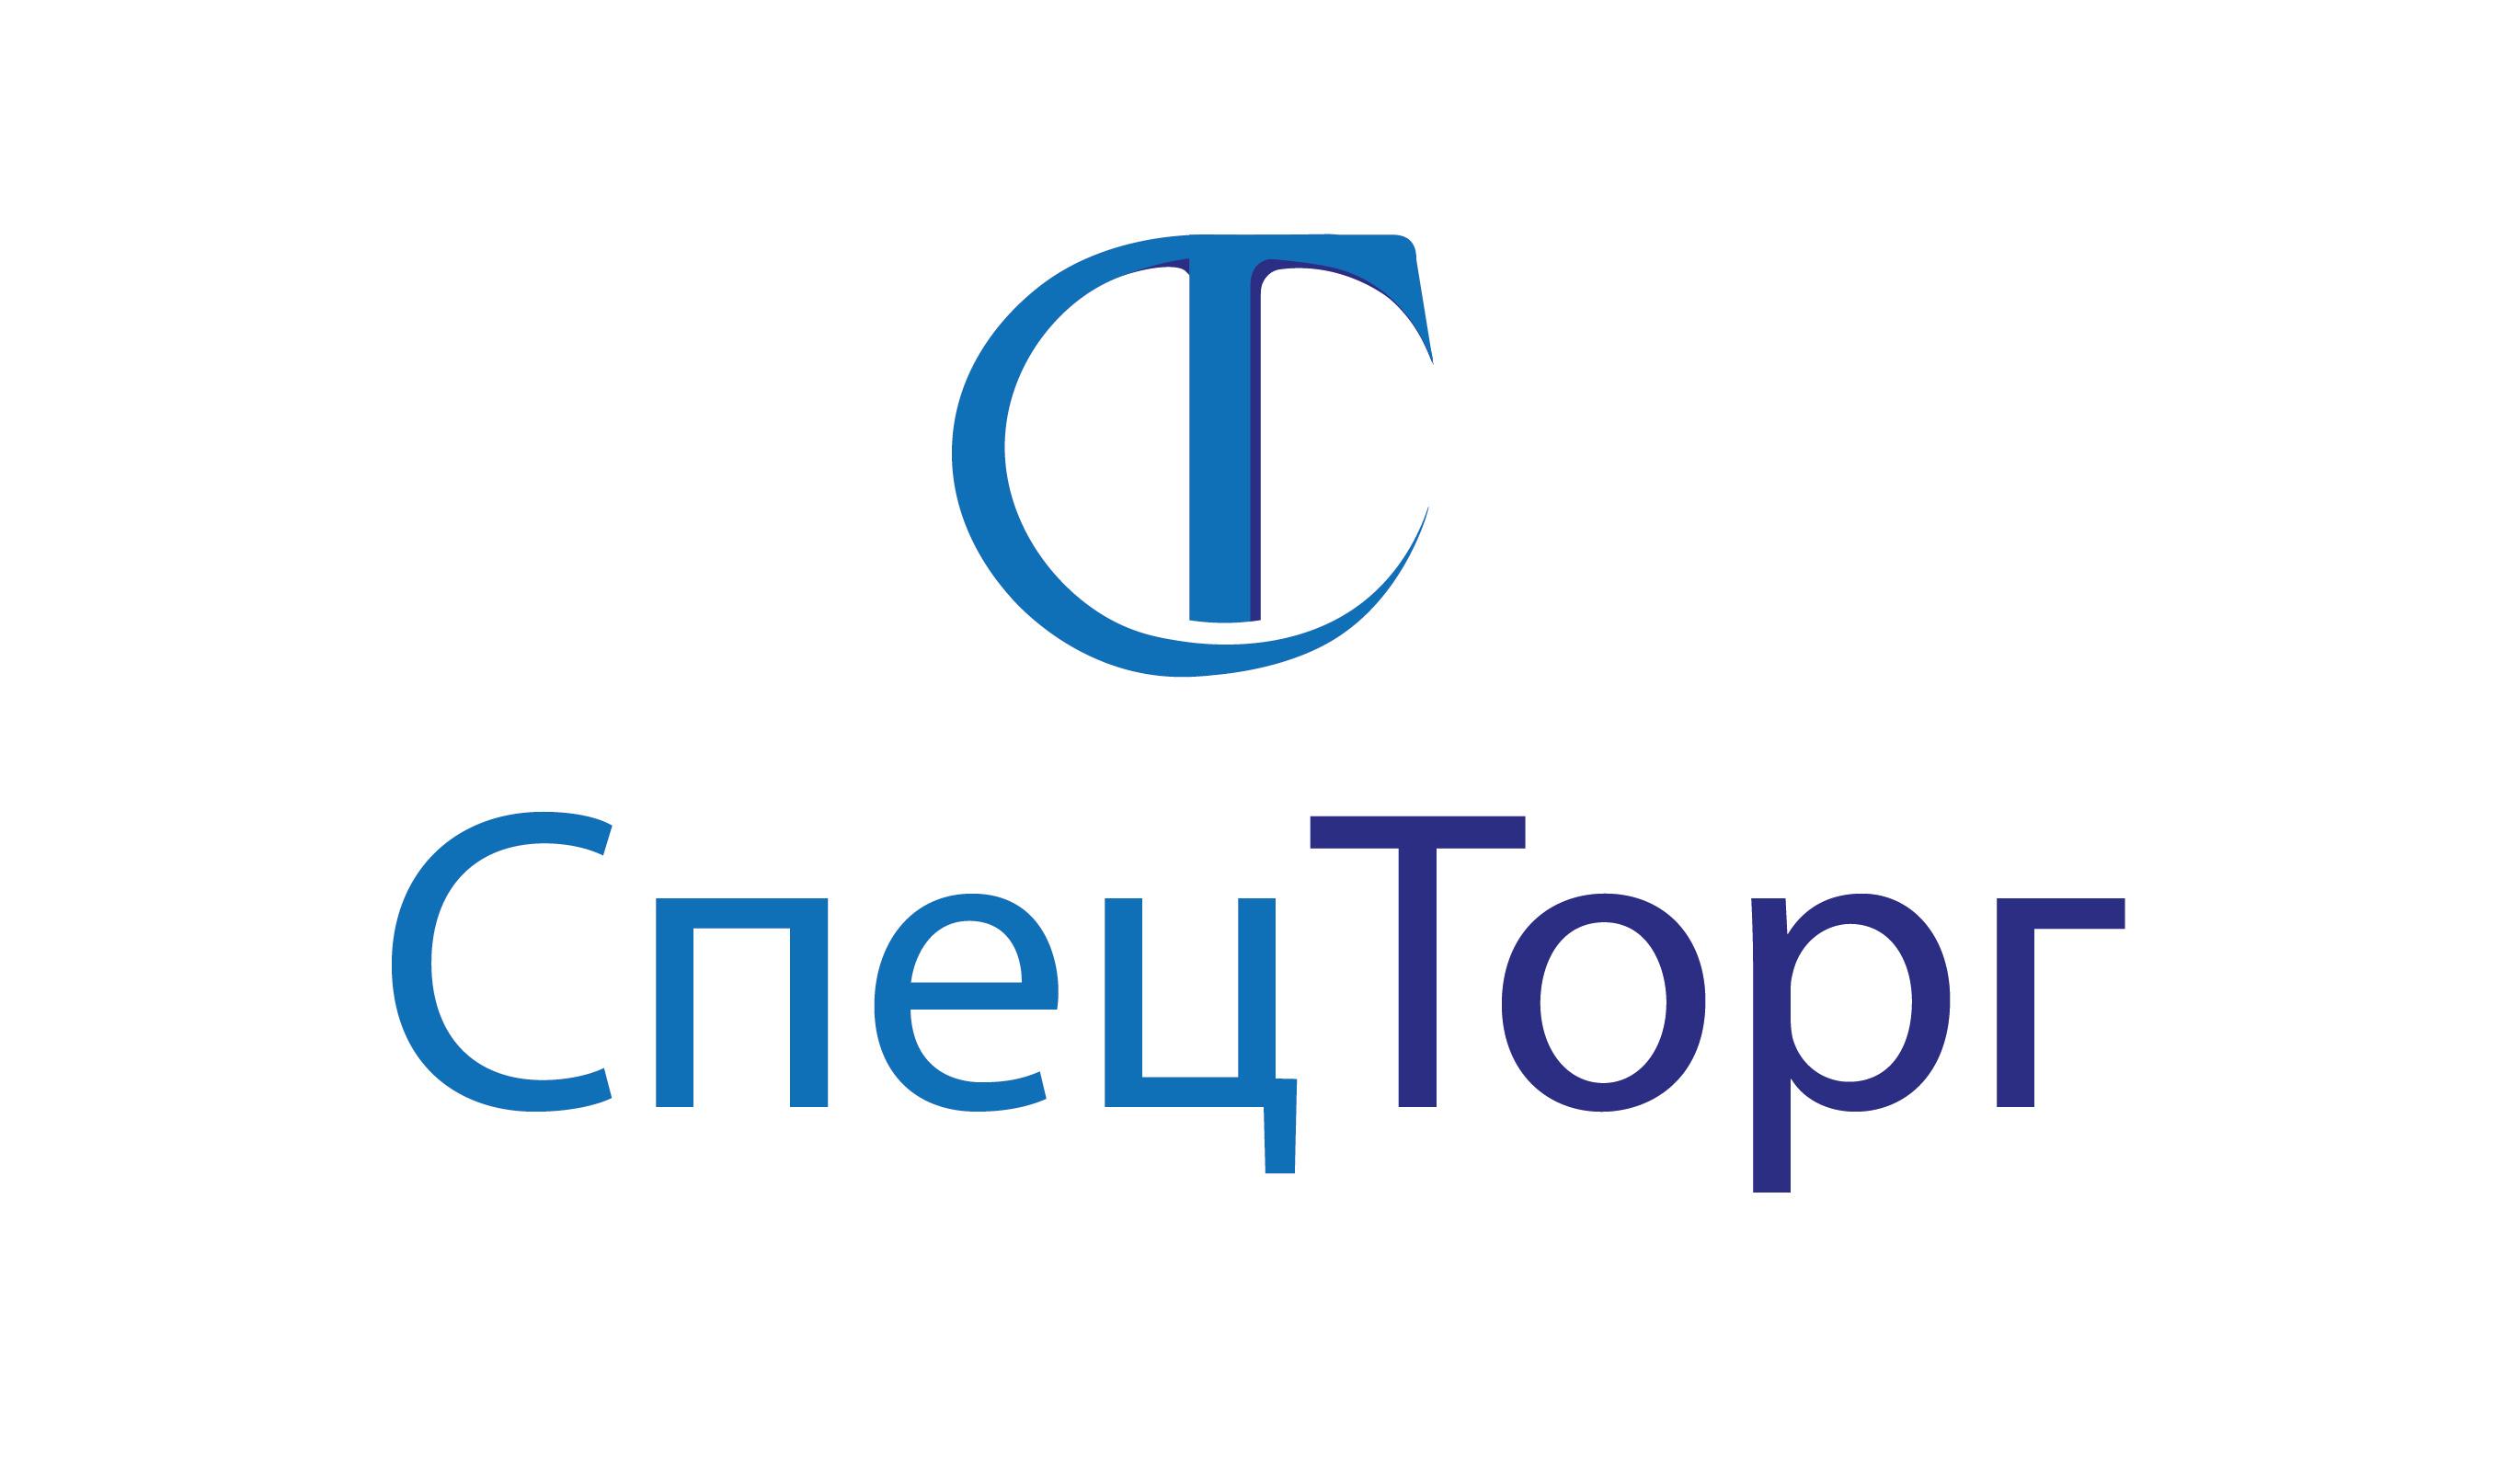 Разработать дизайн  логотипа компании фото f_9385dc2db799f235.jpg